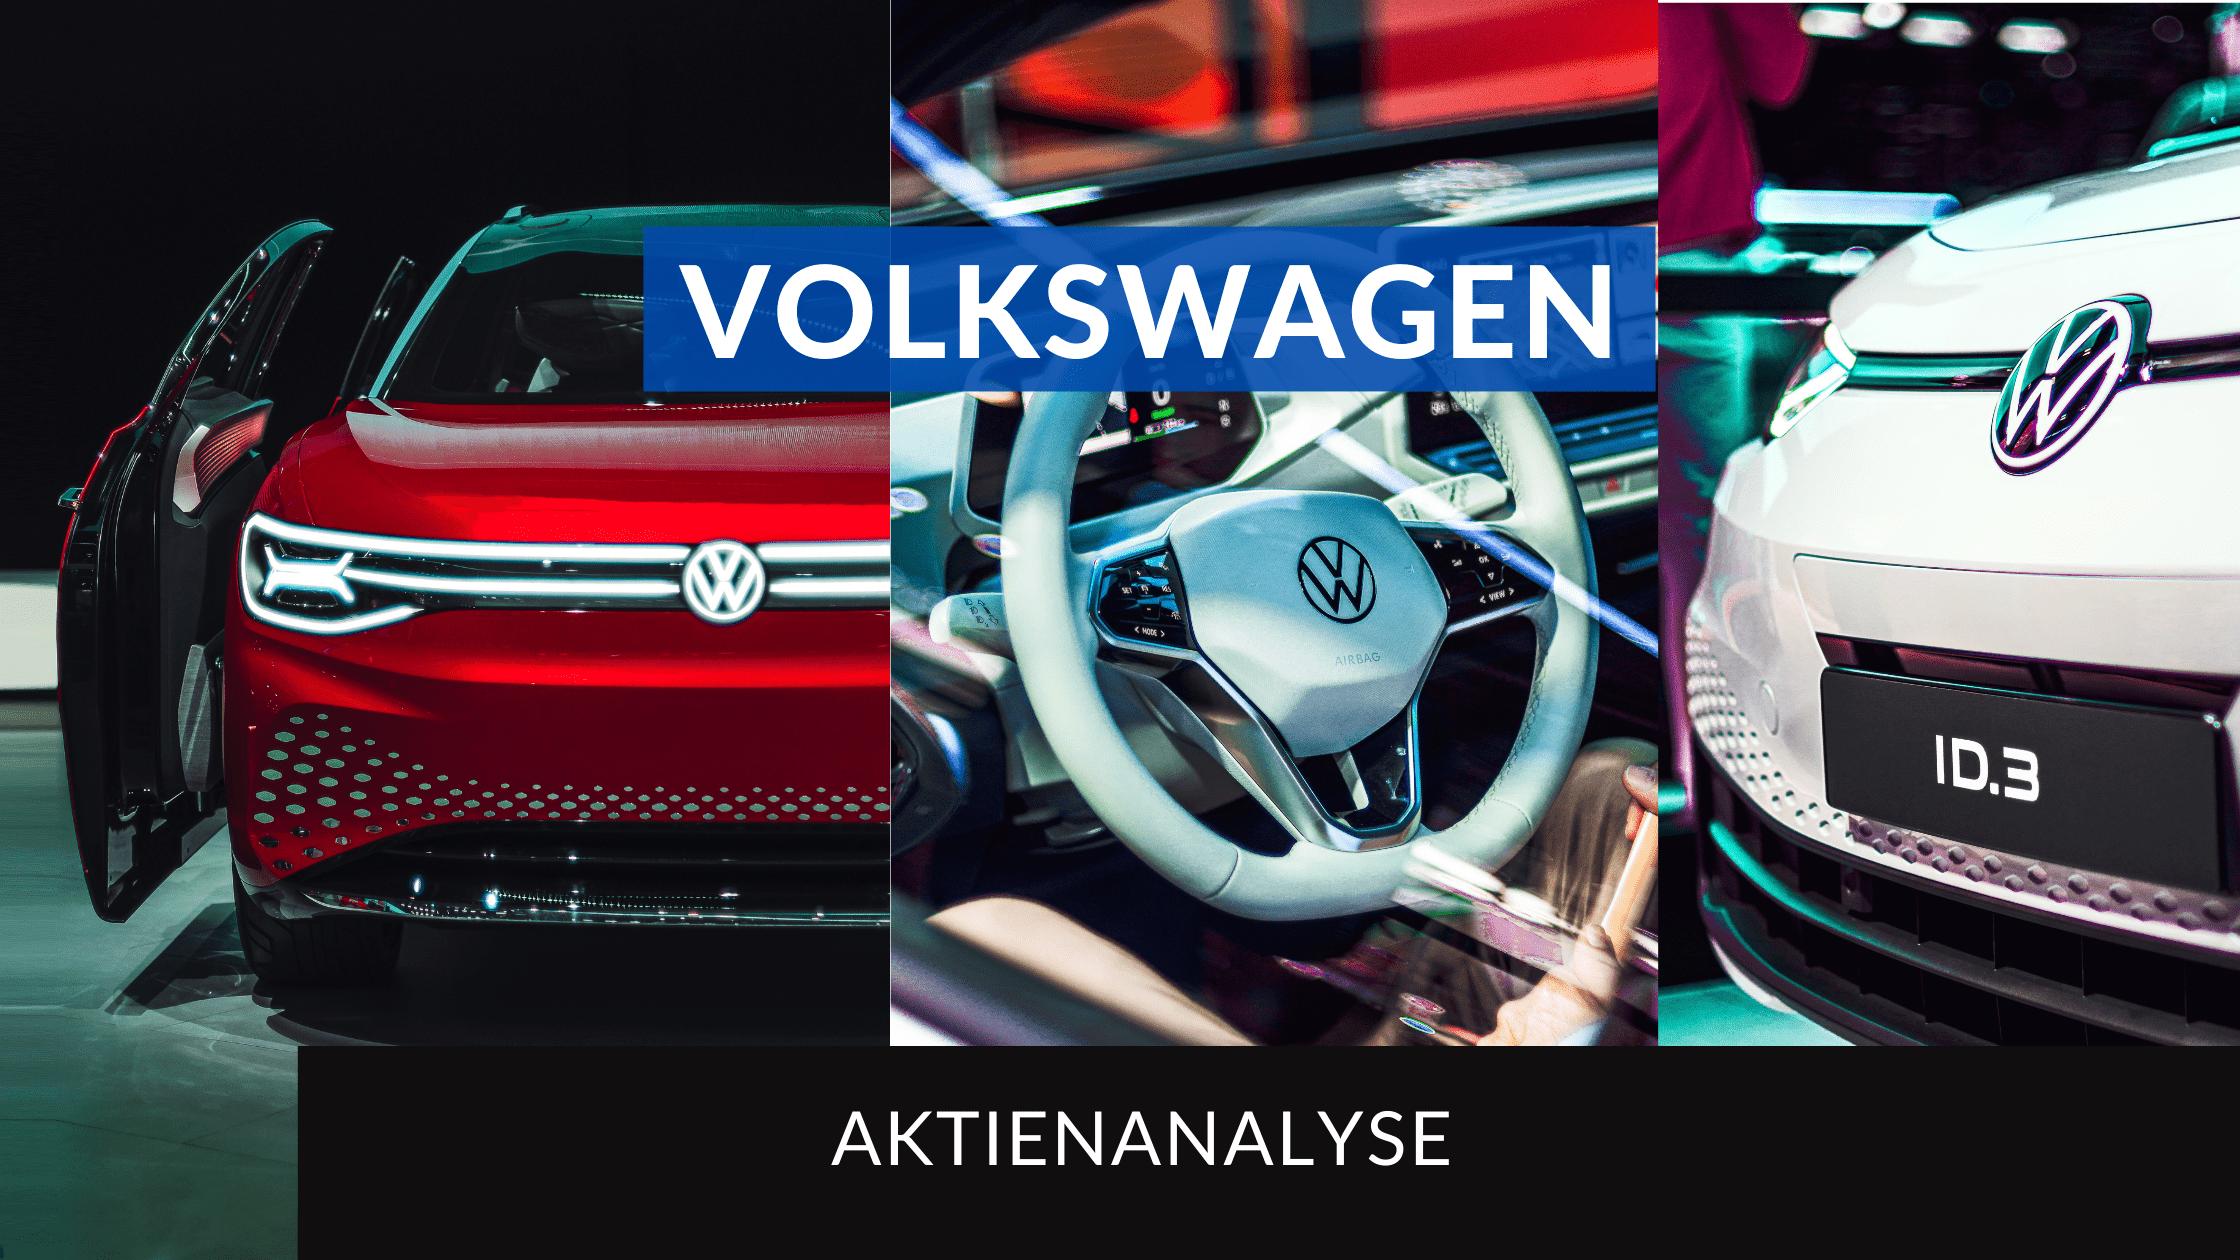 Volkswagen Aktienanalyse